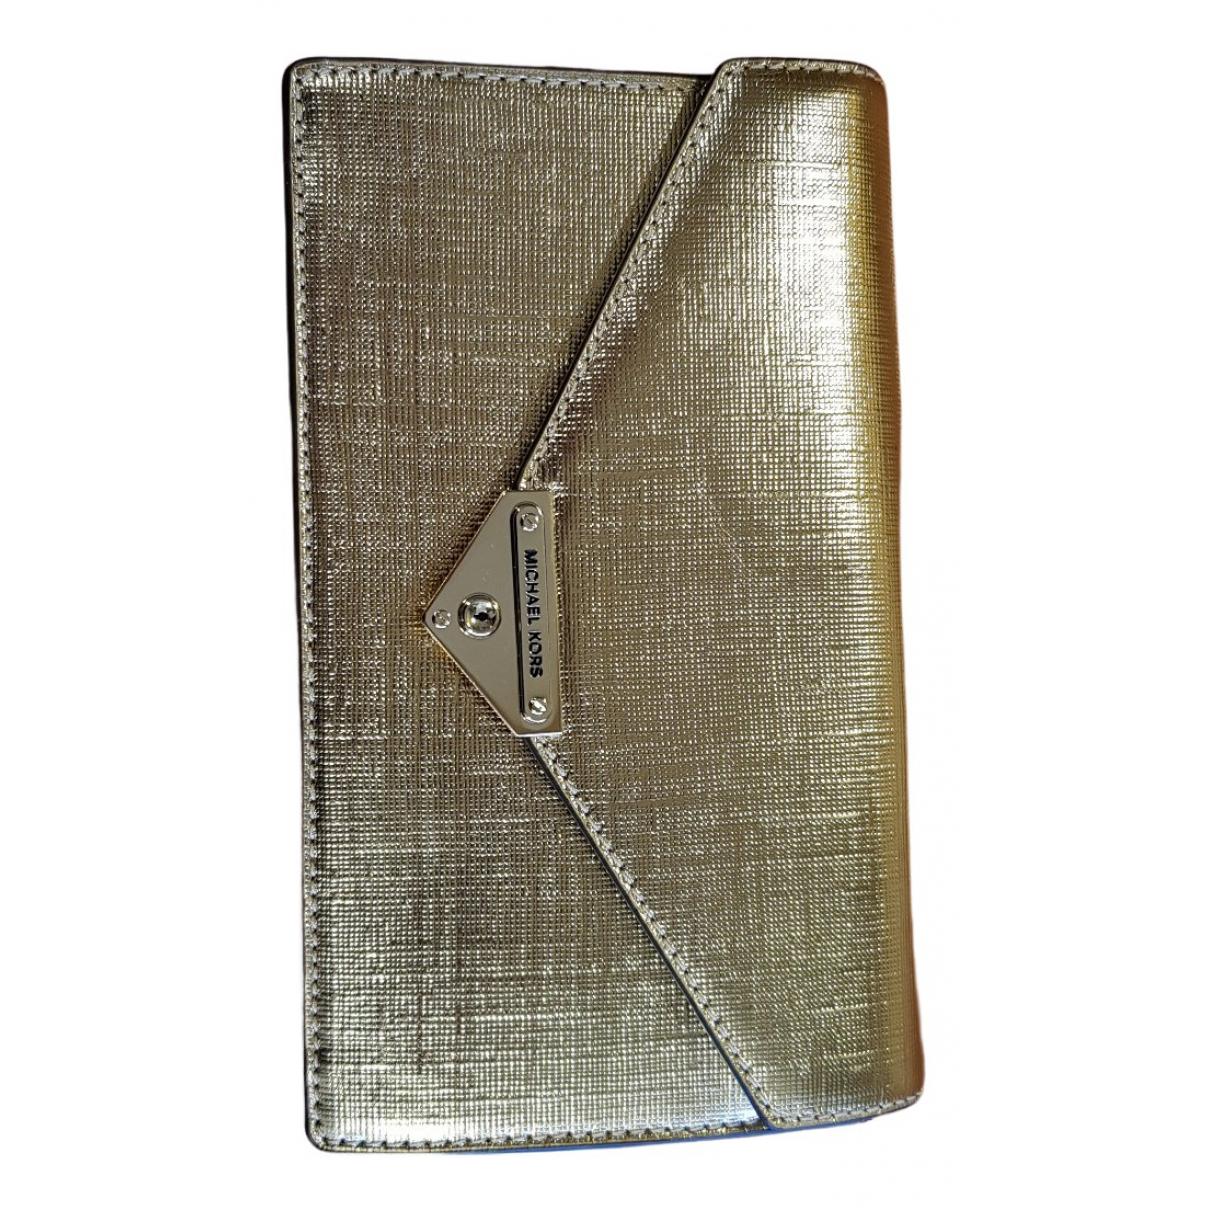 Michael Kors N Gold Clutch bag for Women N